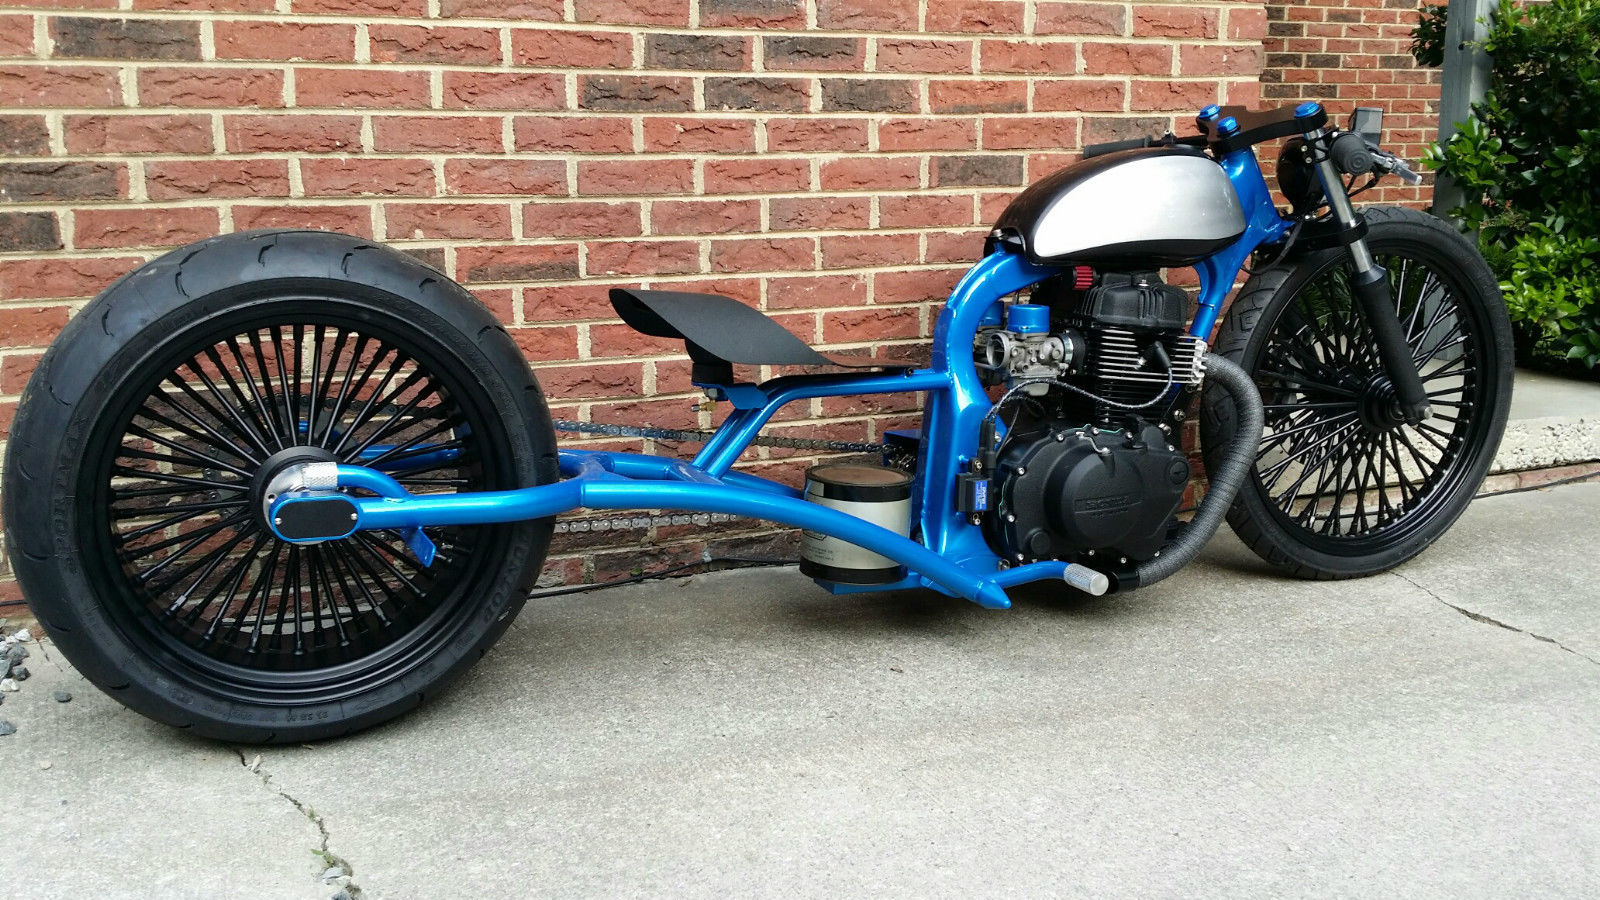 Honda Bar Hopper Bobber W Harley Wheels Chopper Street Bike